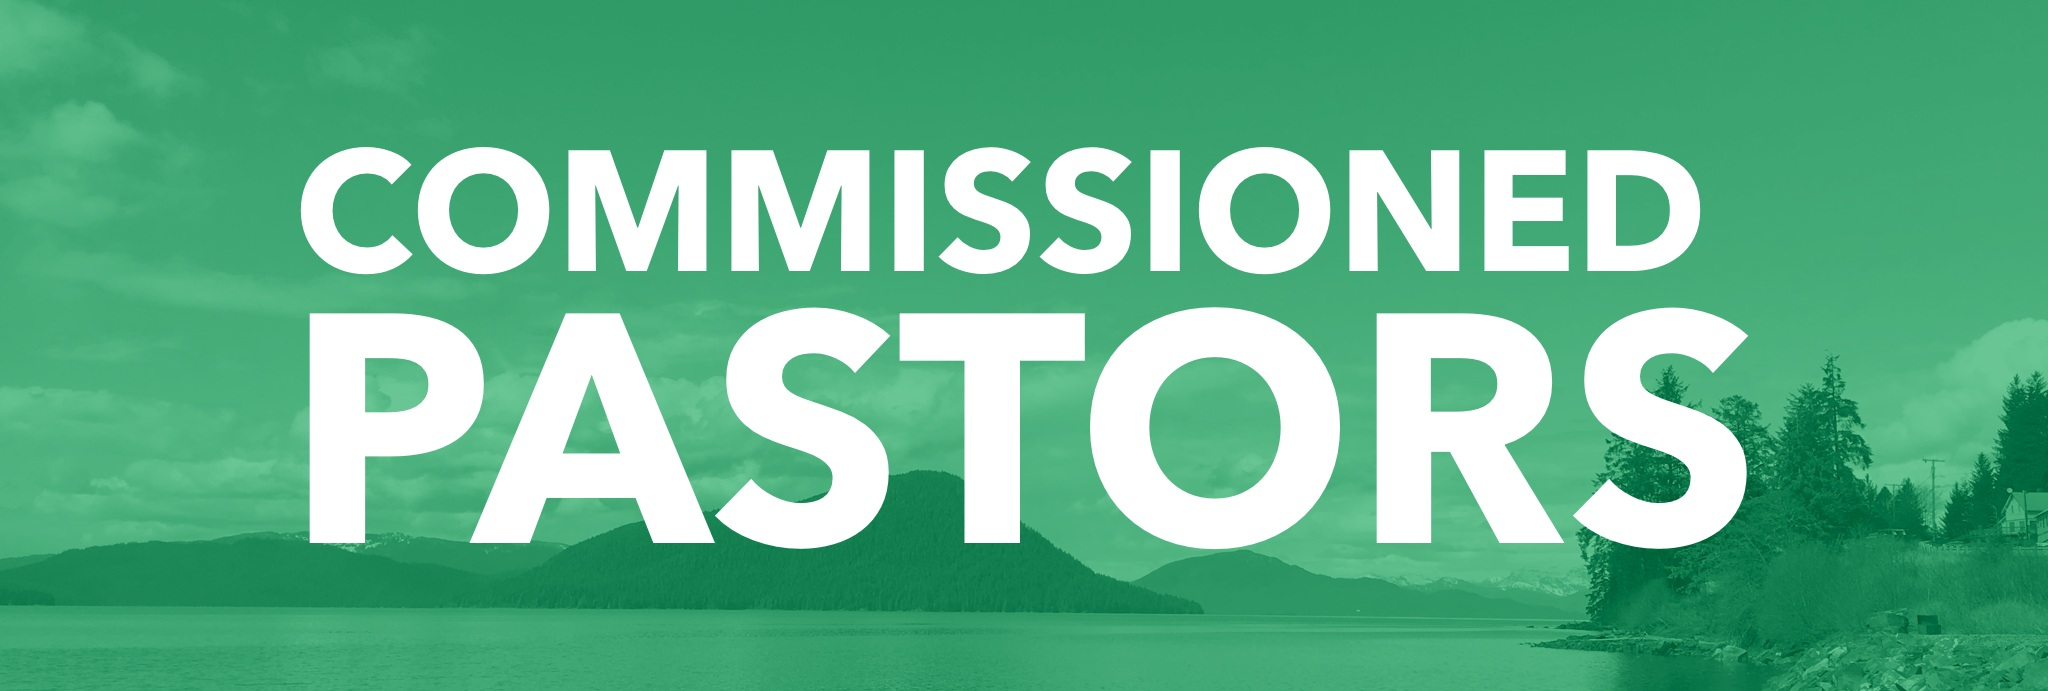 Commissioned+Pastors.jpg